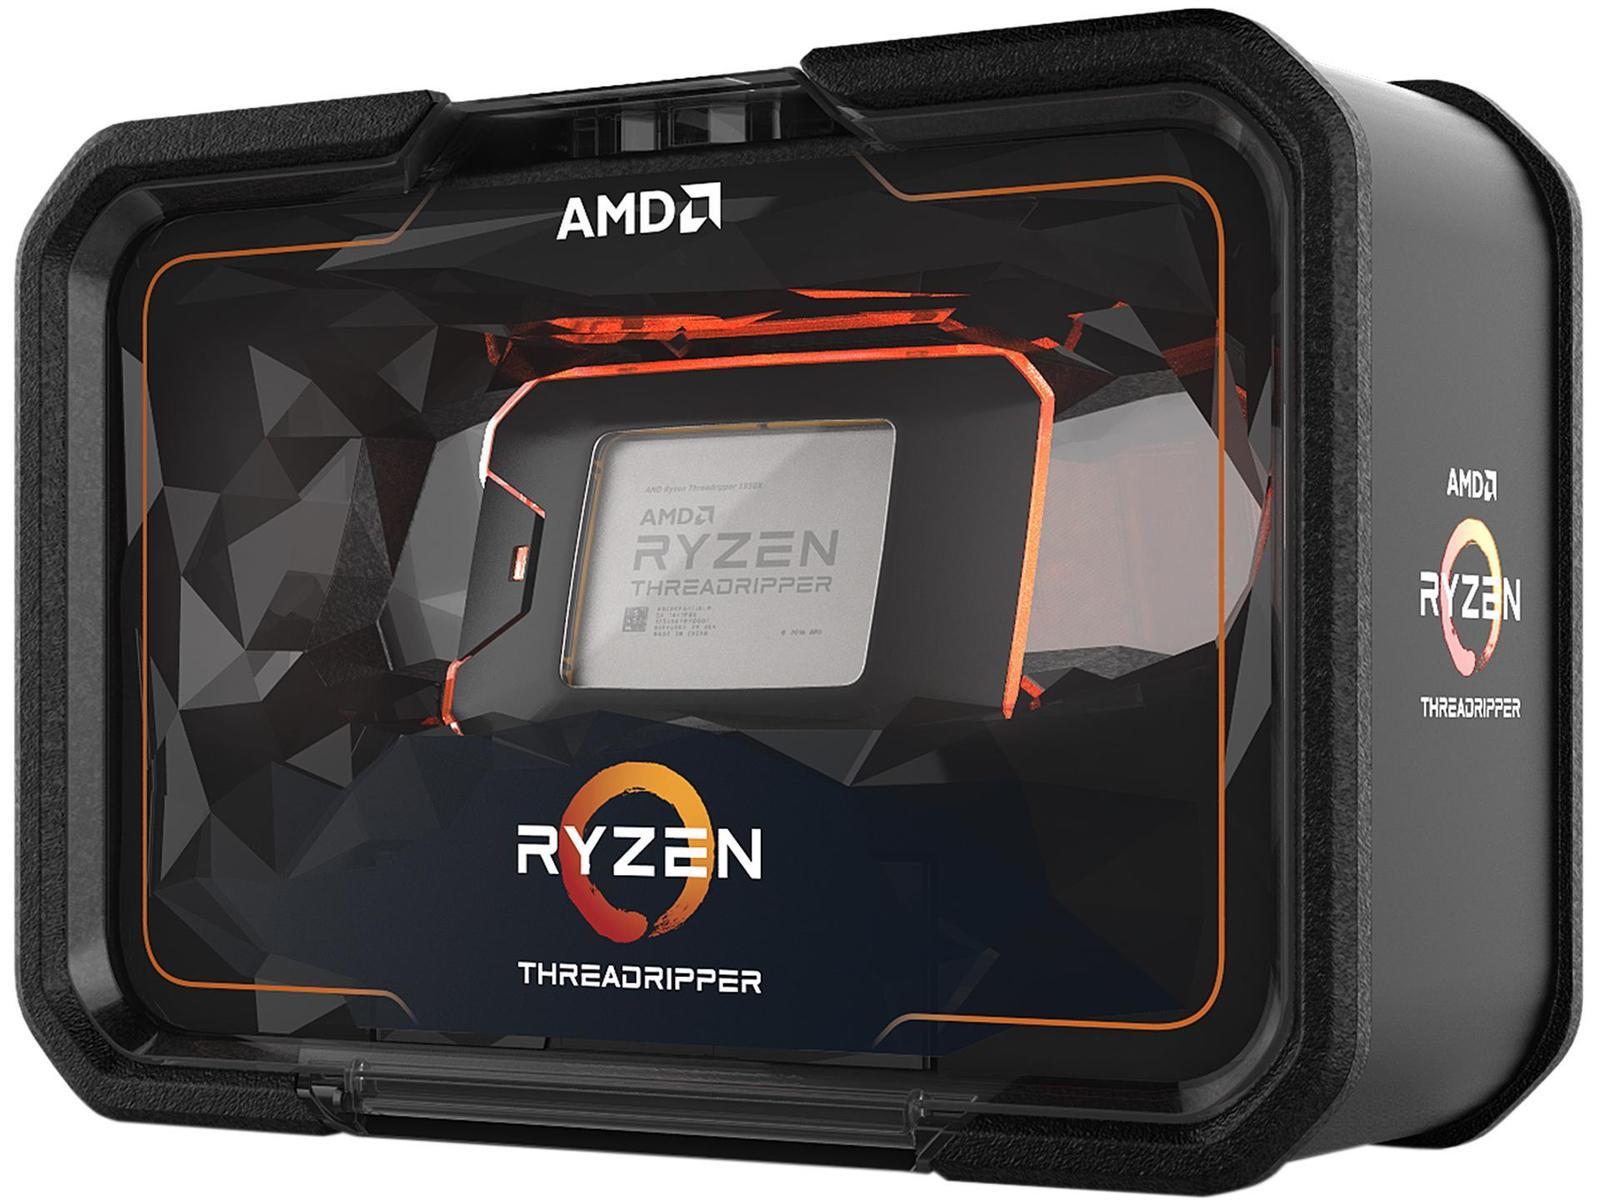 AMD Threadripper 2950X 3.5 GHz 16-Core Processor